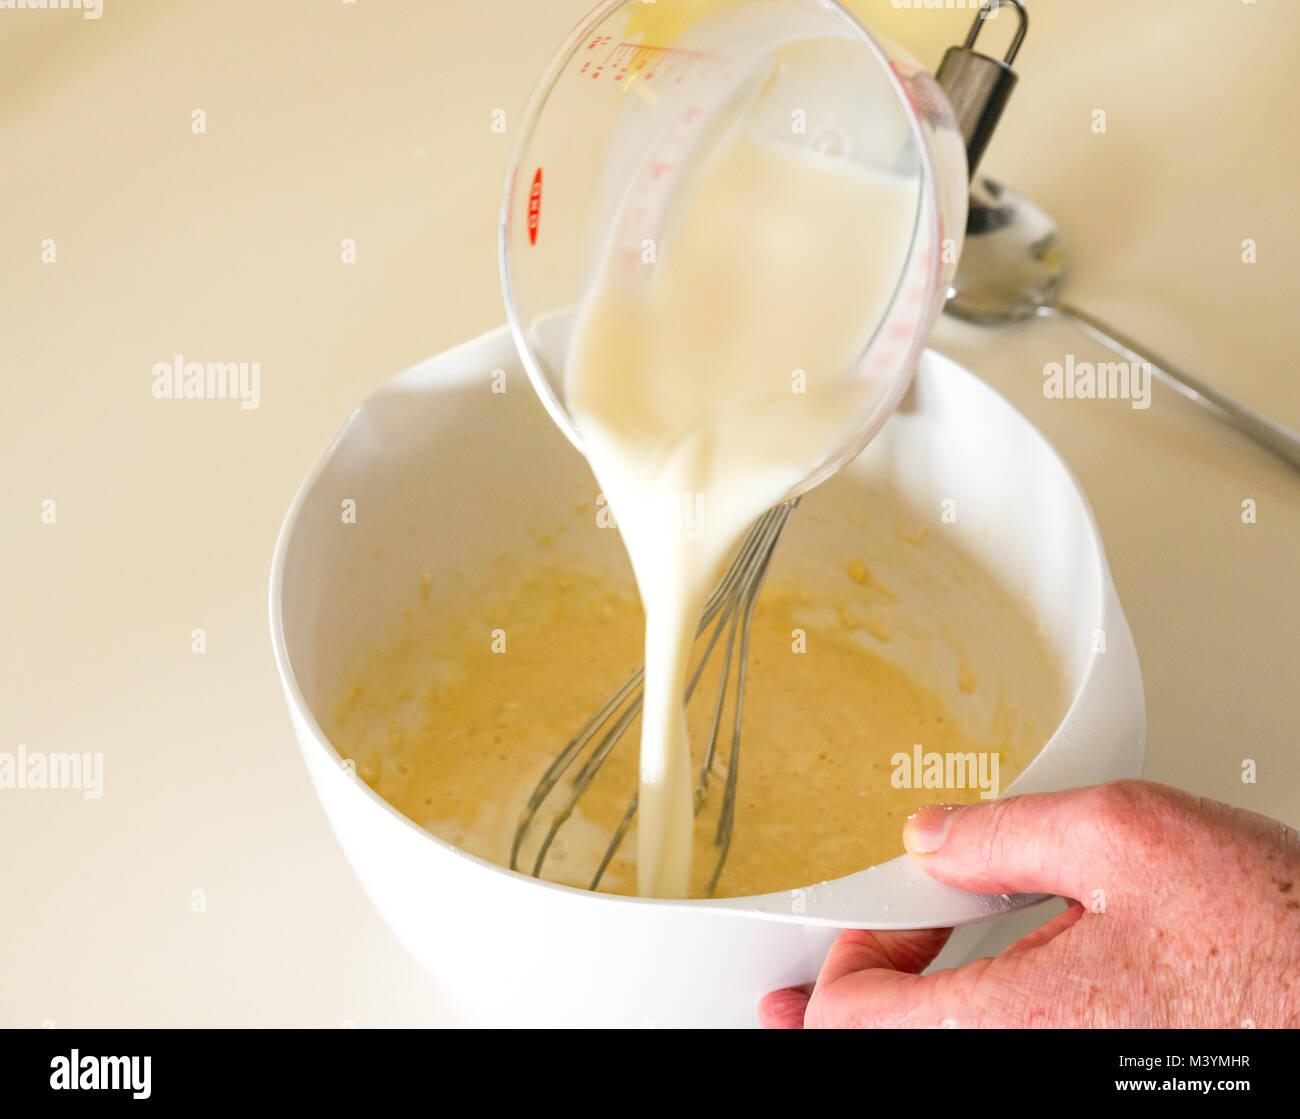 how to make powdered milk into milk